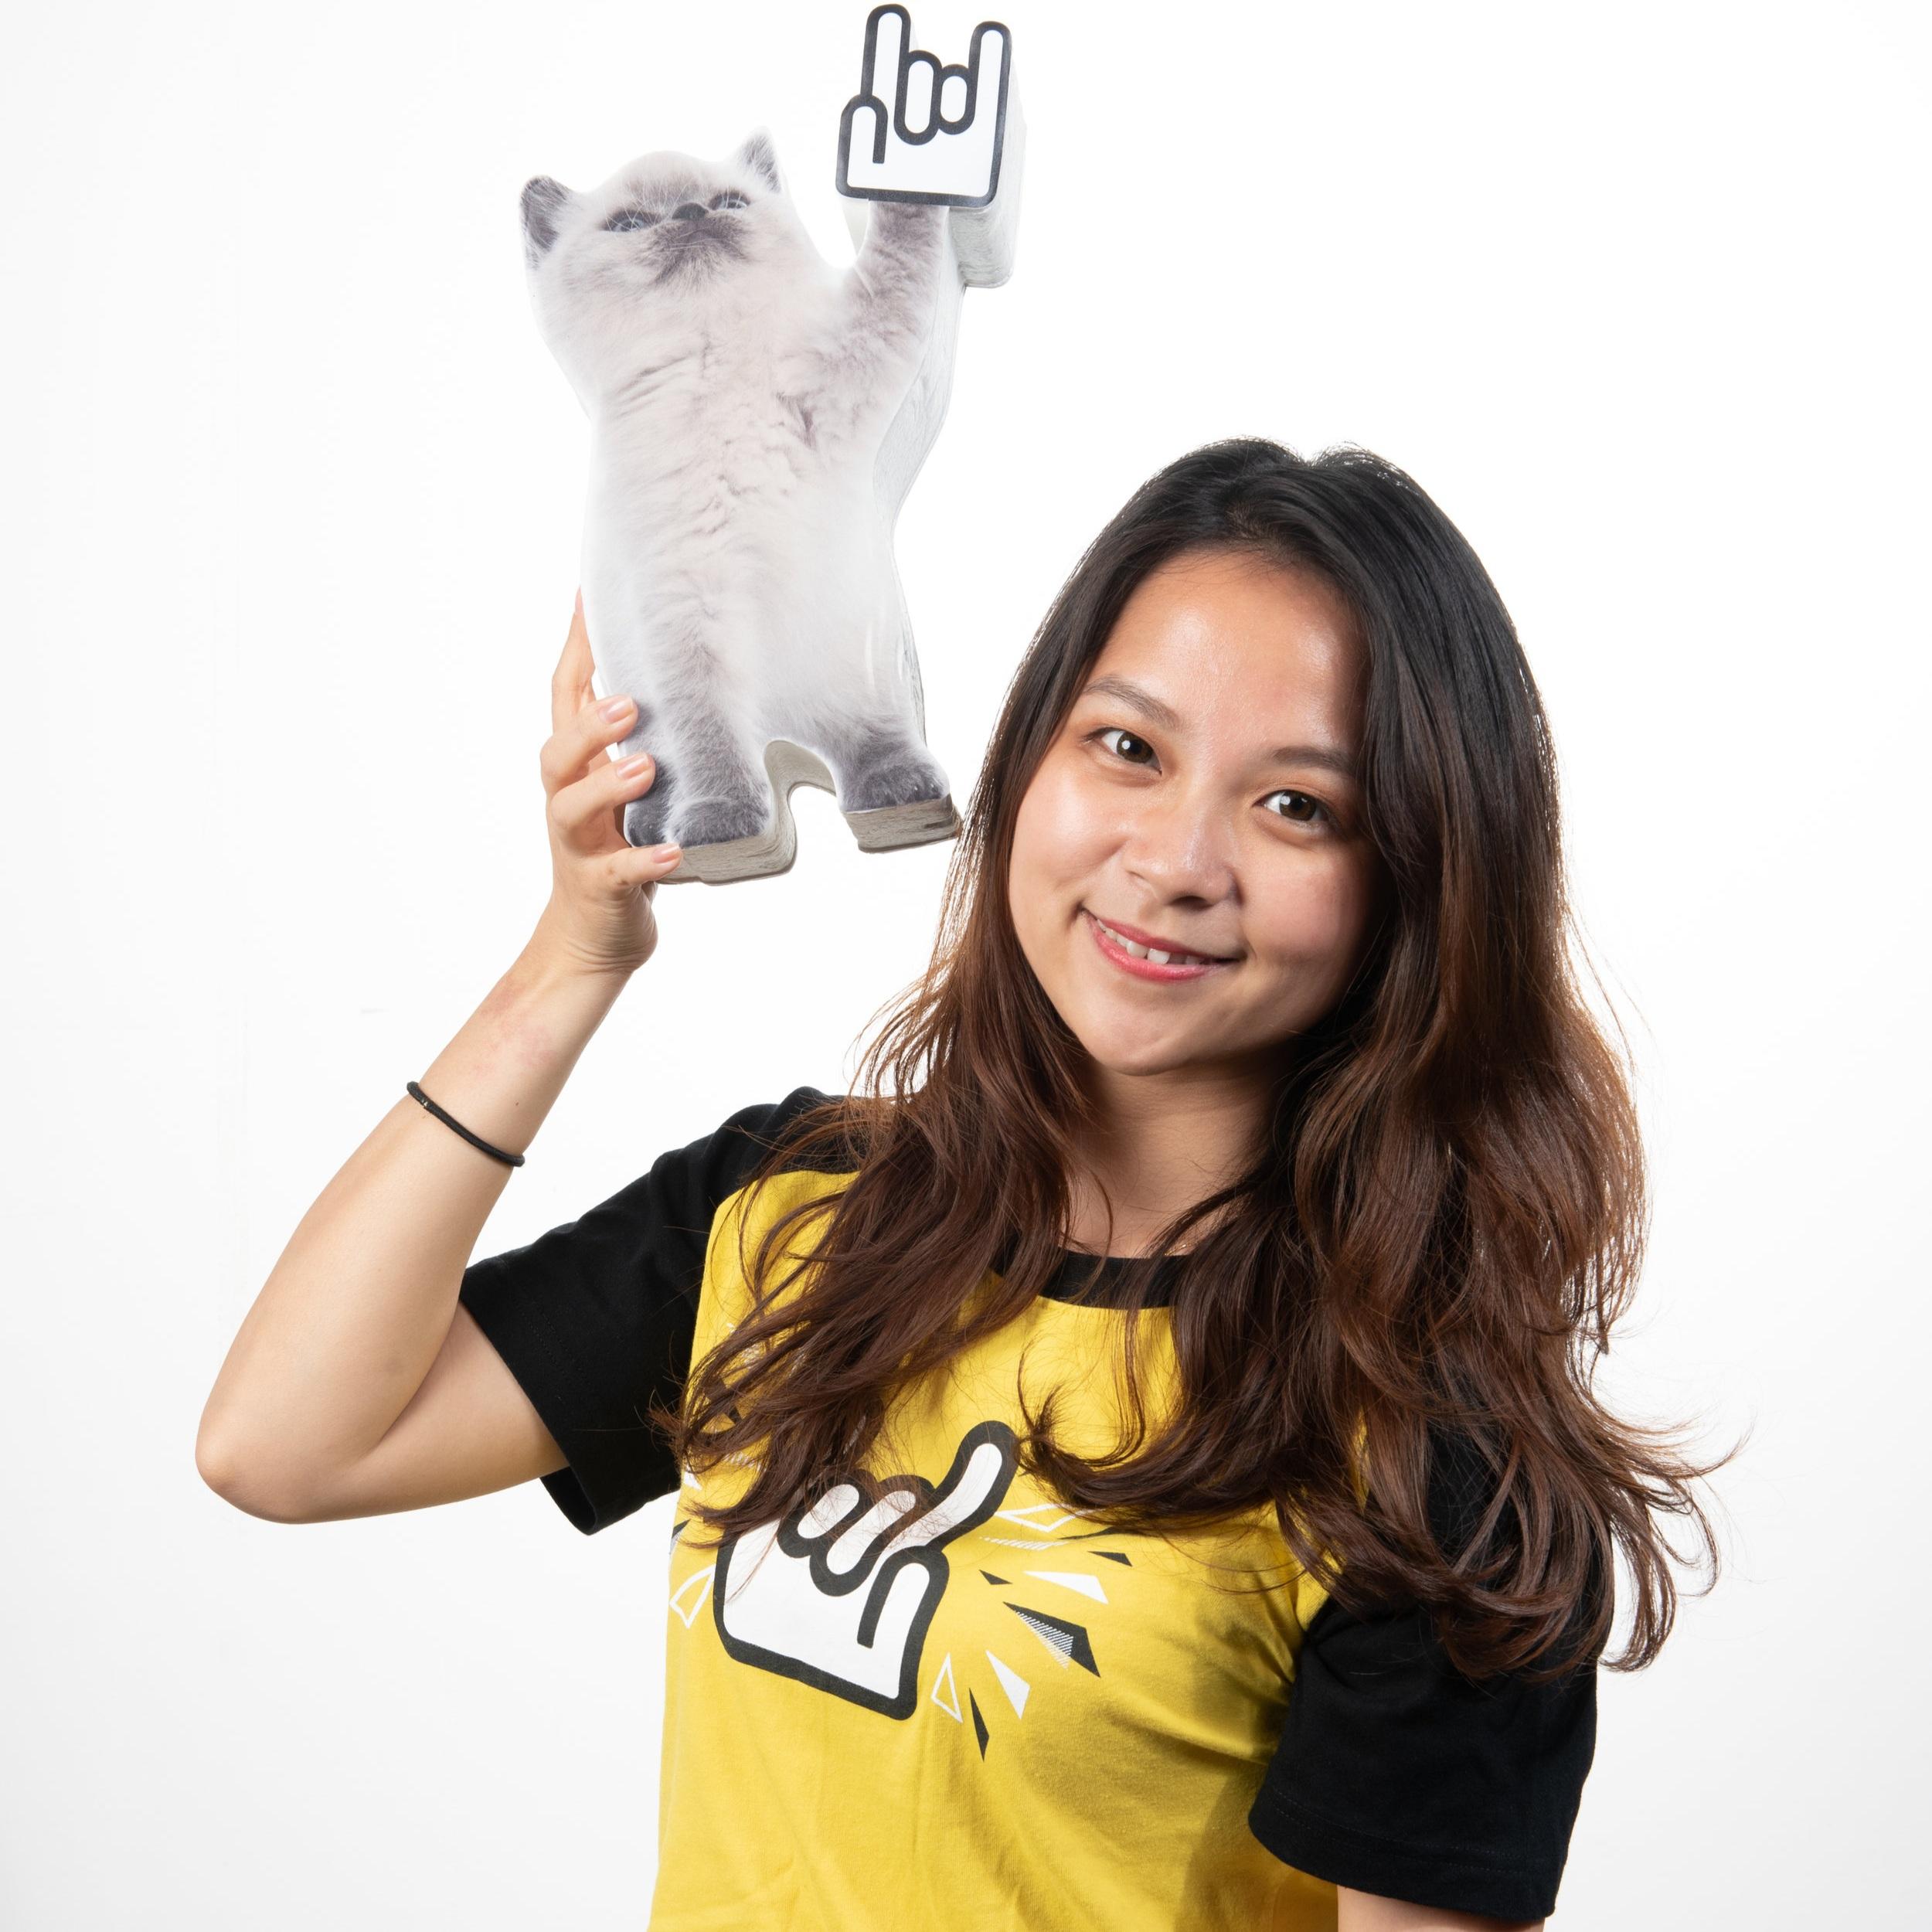 Stephanie wu | 吳宜玲  Manager, community relations